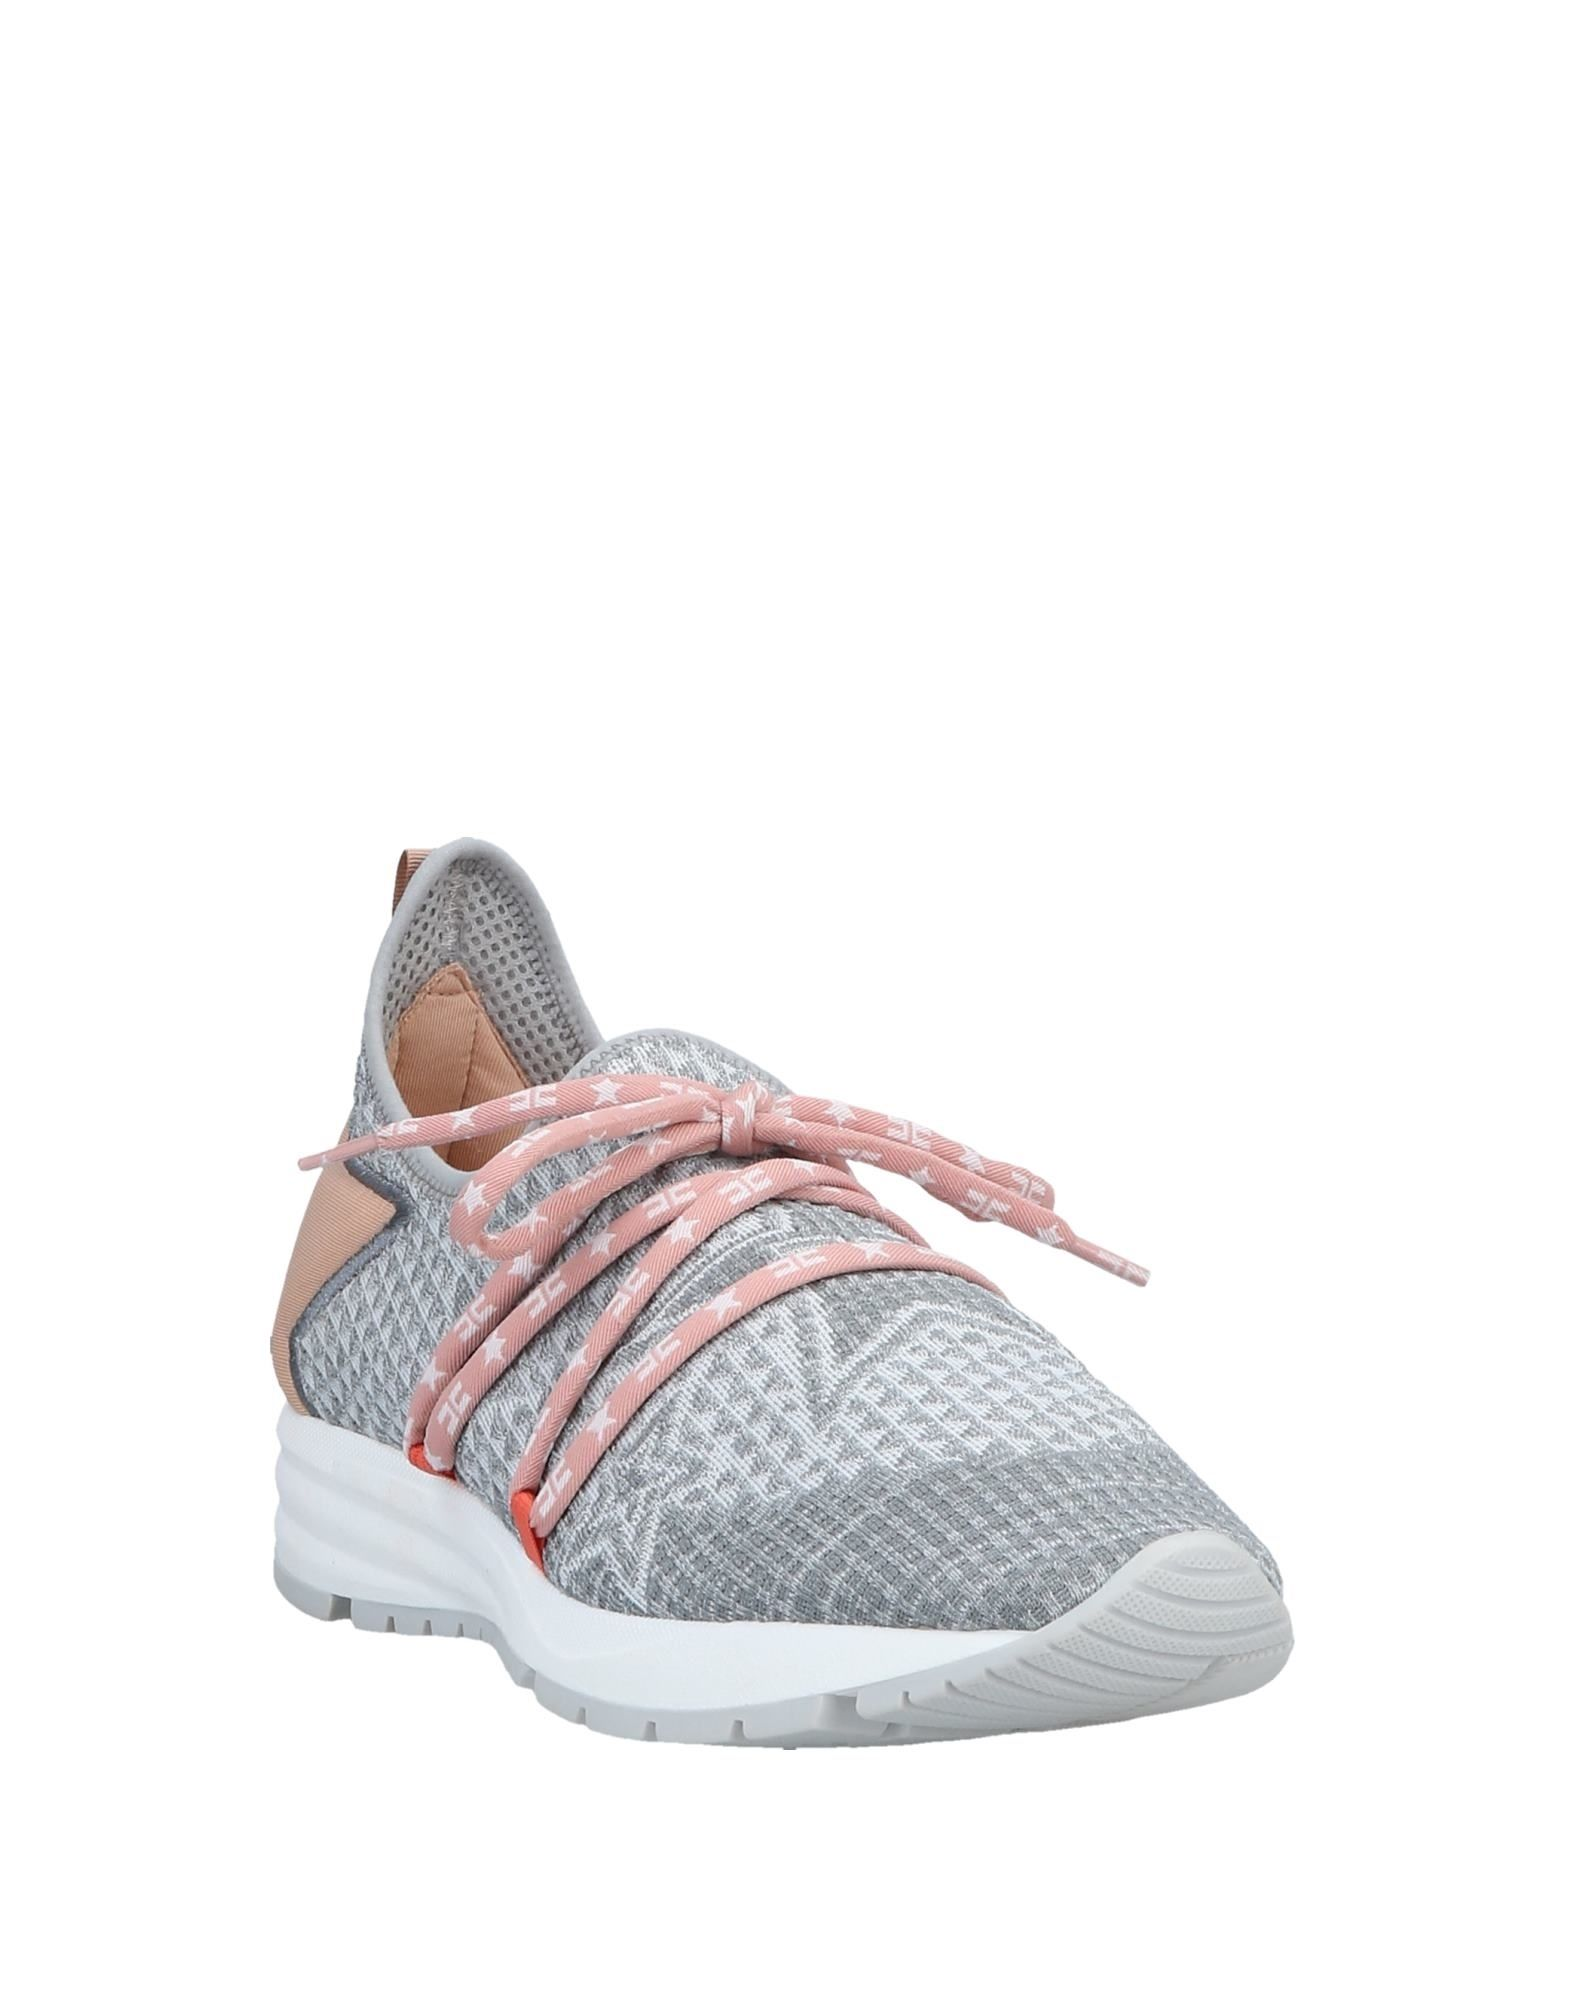 Gut um billige Schuhe  zu tragenElisabetta Franchi Sneakers Damen  Schuhe 11509384WV 5bdb35